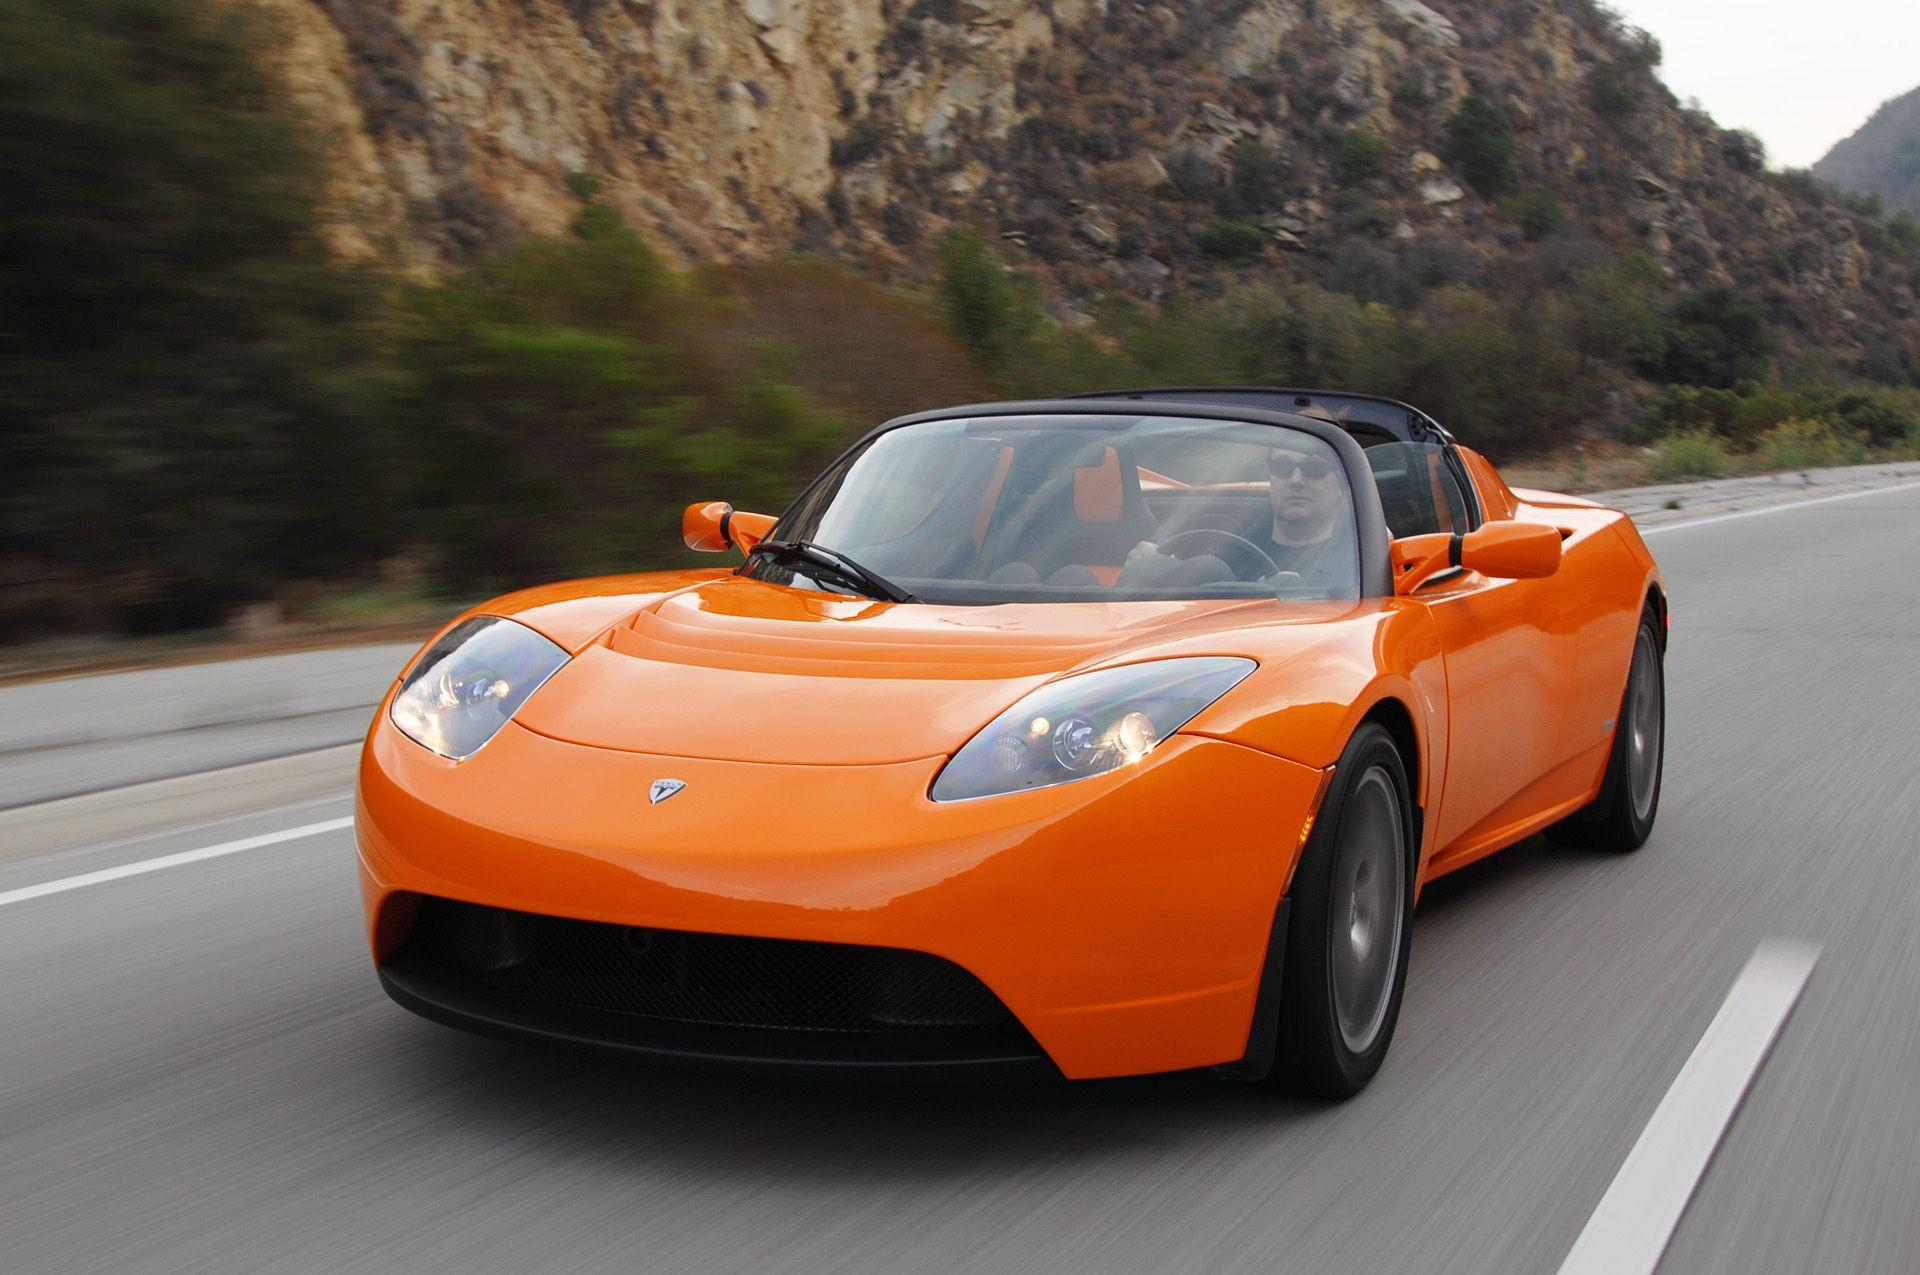 Tesla Roadster 2020 Cars electric car 4K 4K wallpaper